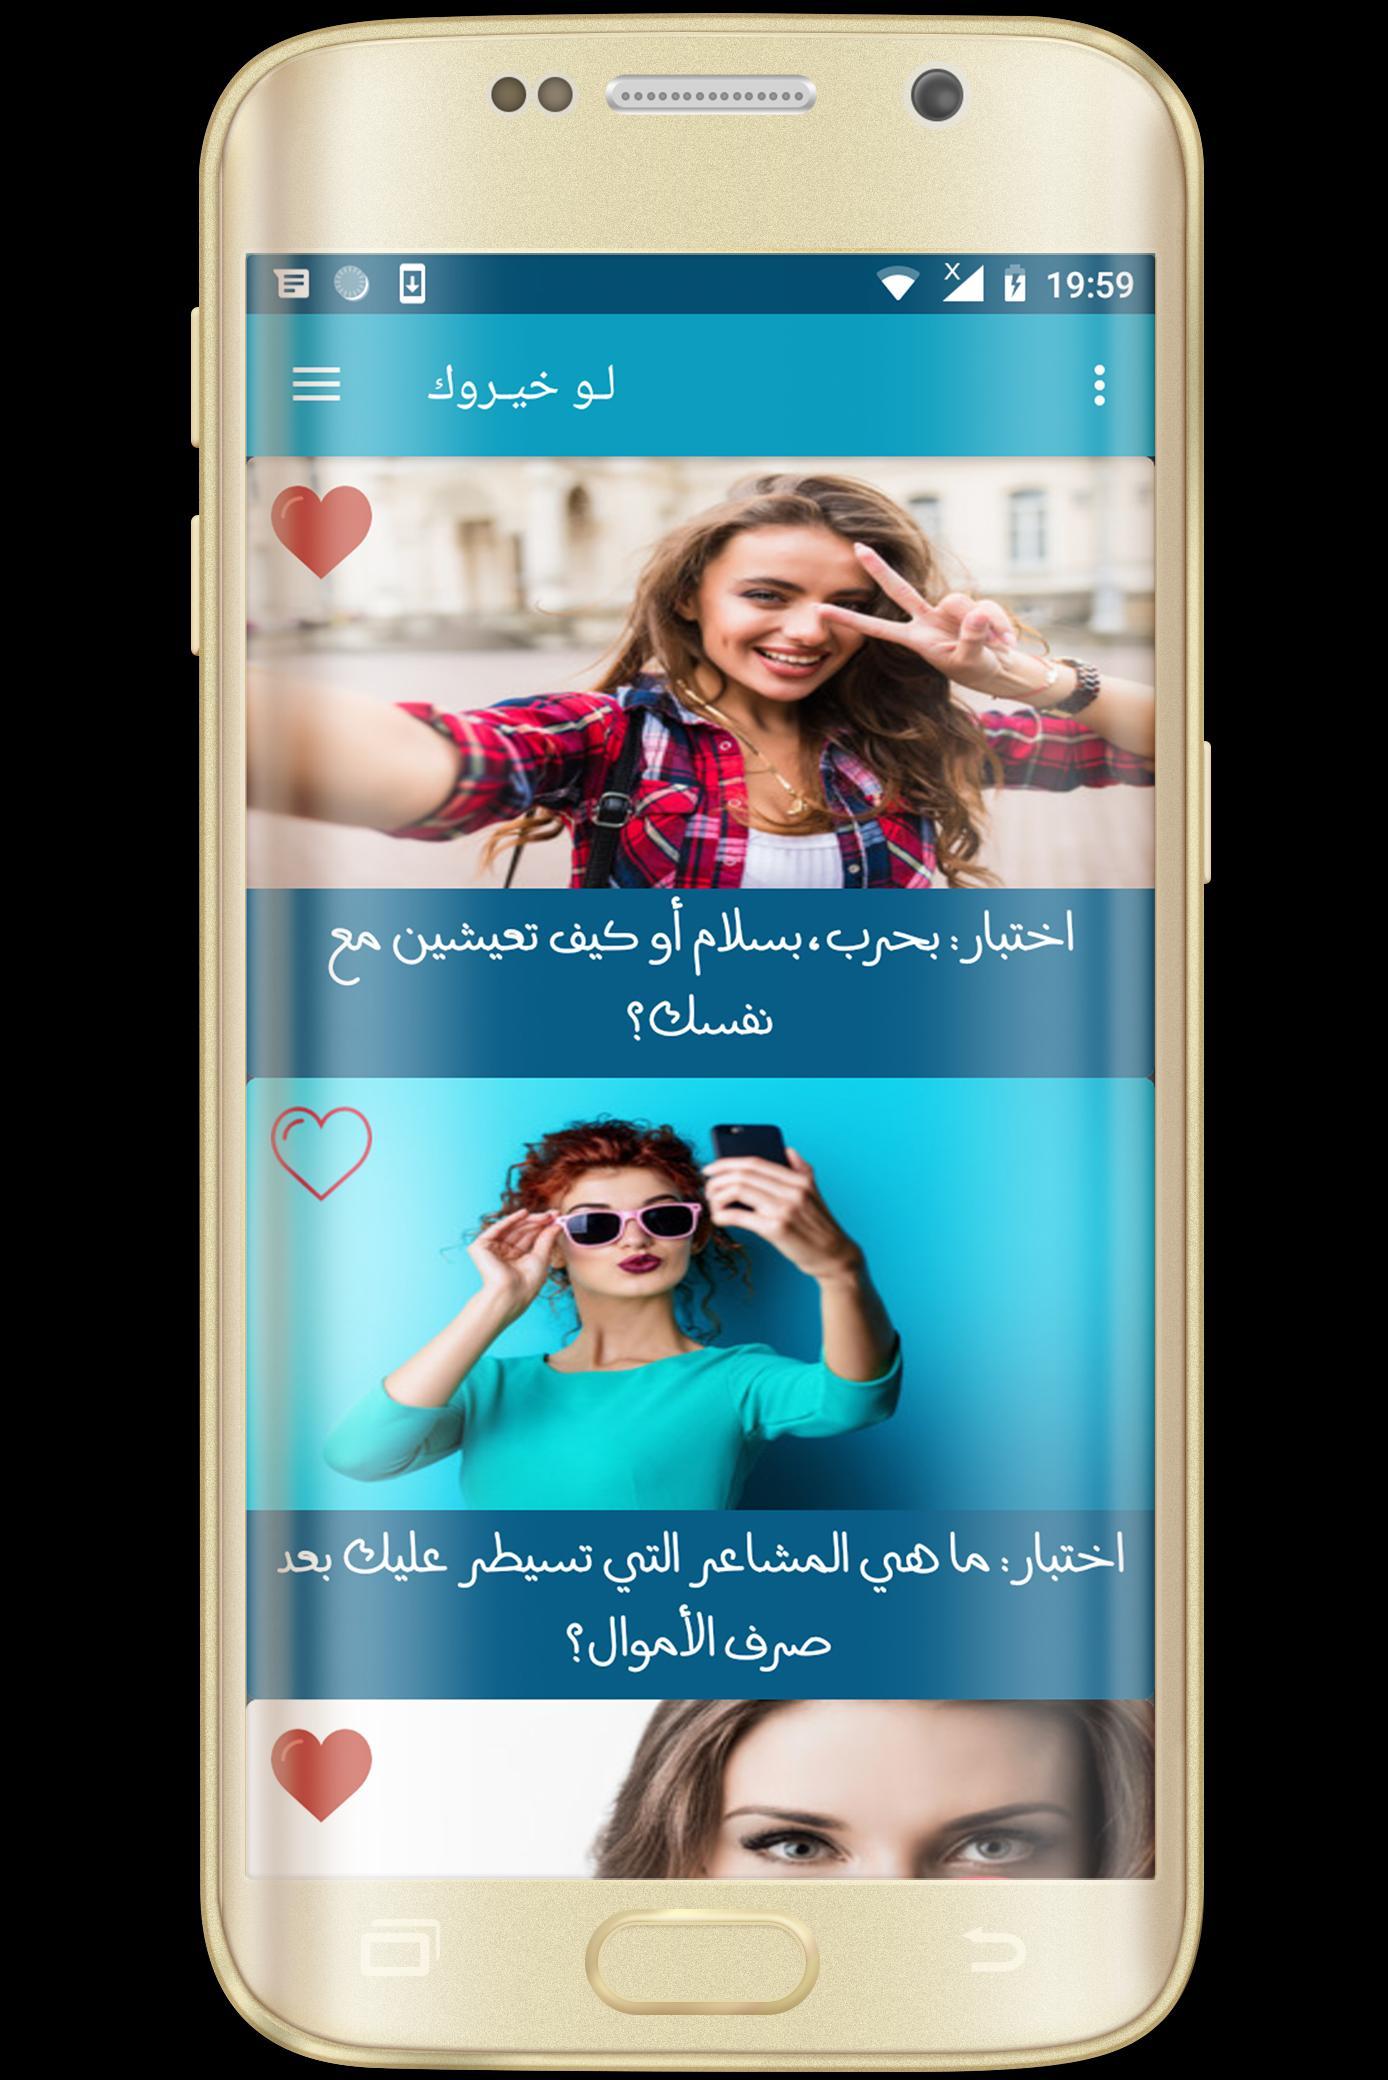 لو خيروك للبنات For Android Apk Download 12